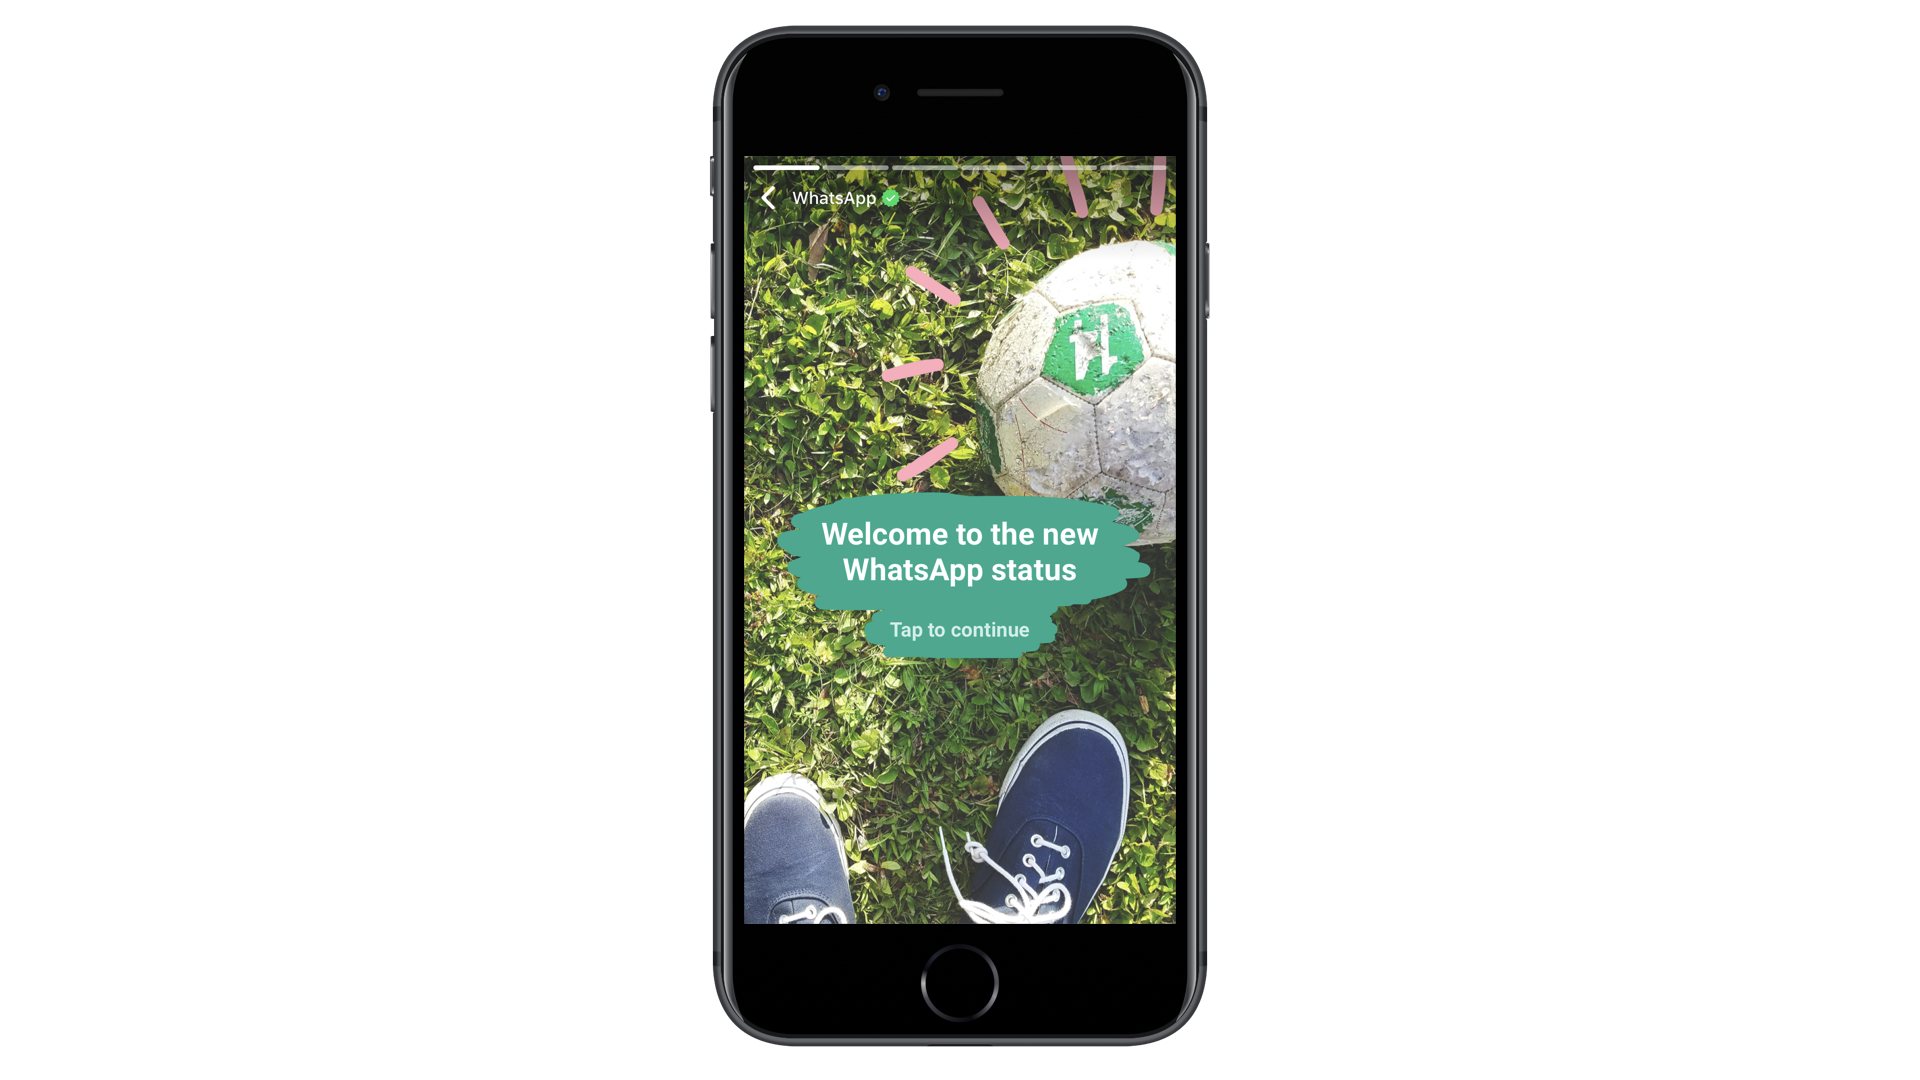 WhatsApp announces Status, its take on Snapchat Stories